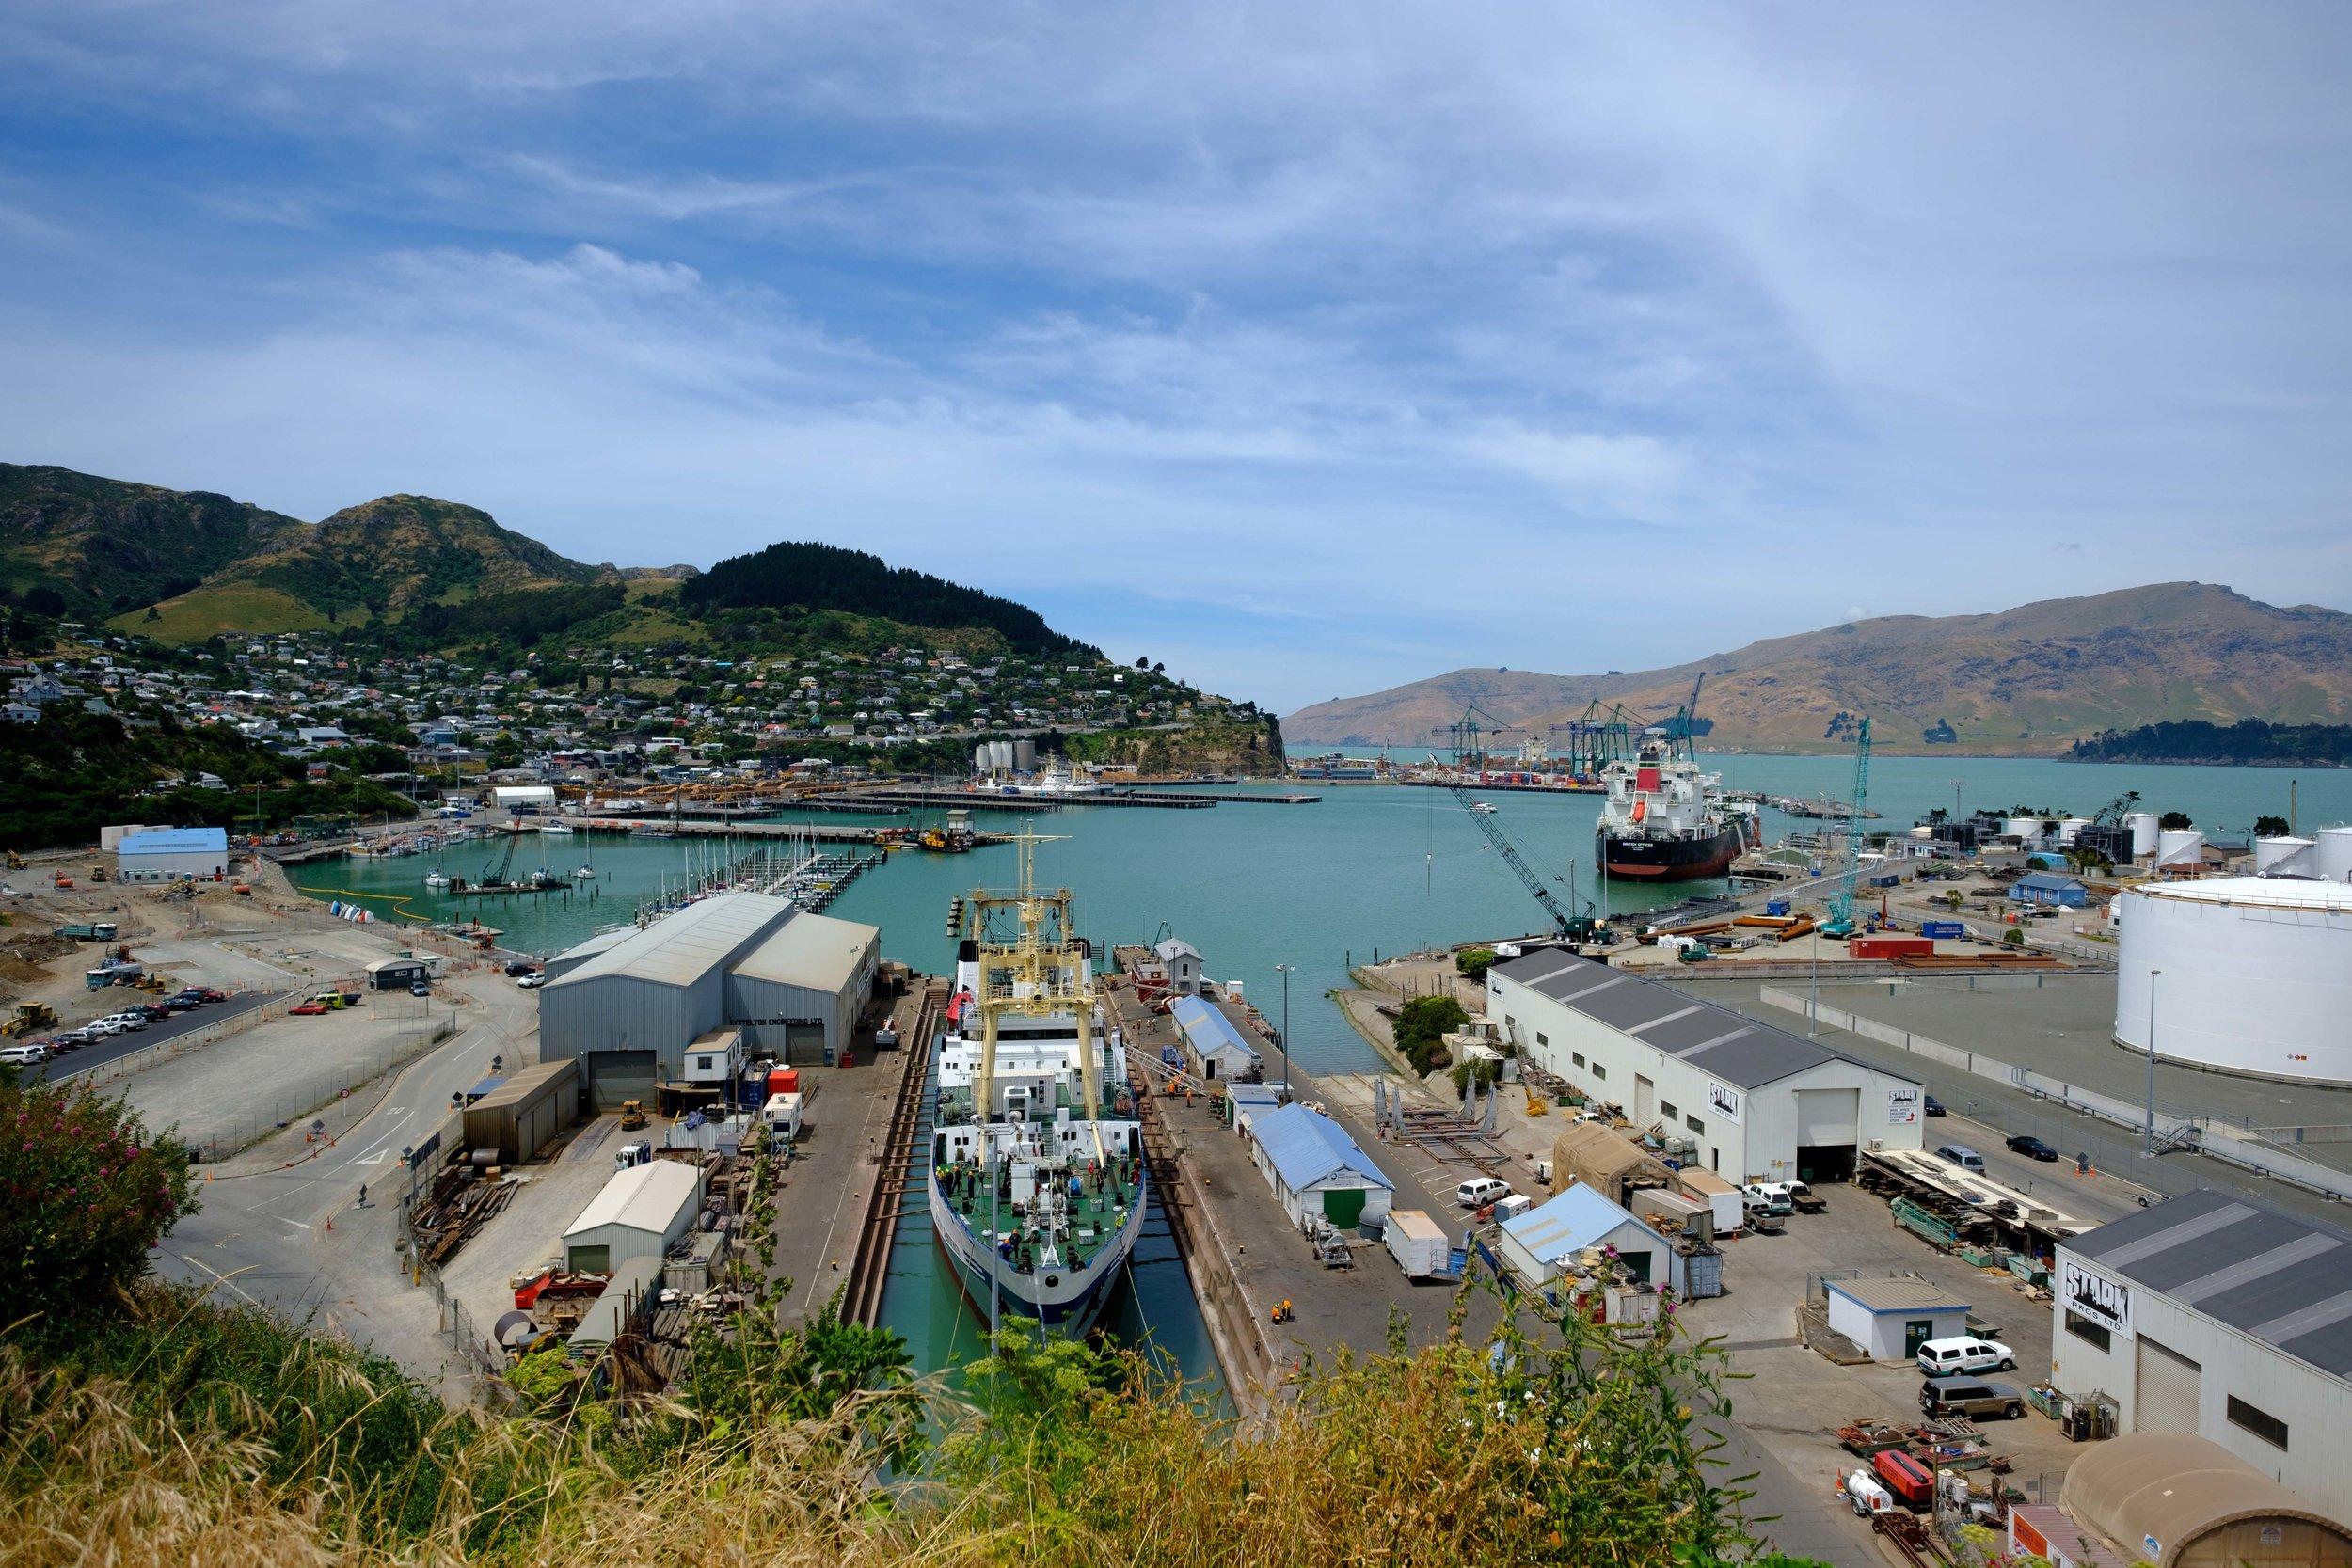 Lyttelton Christchurch Port